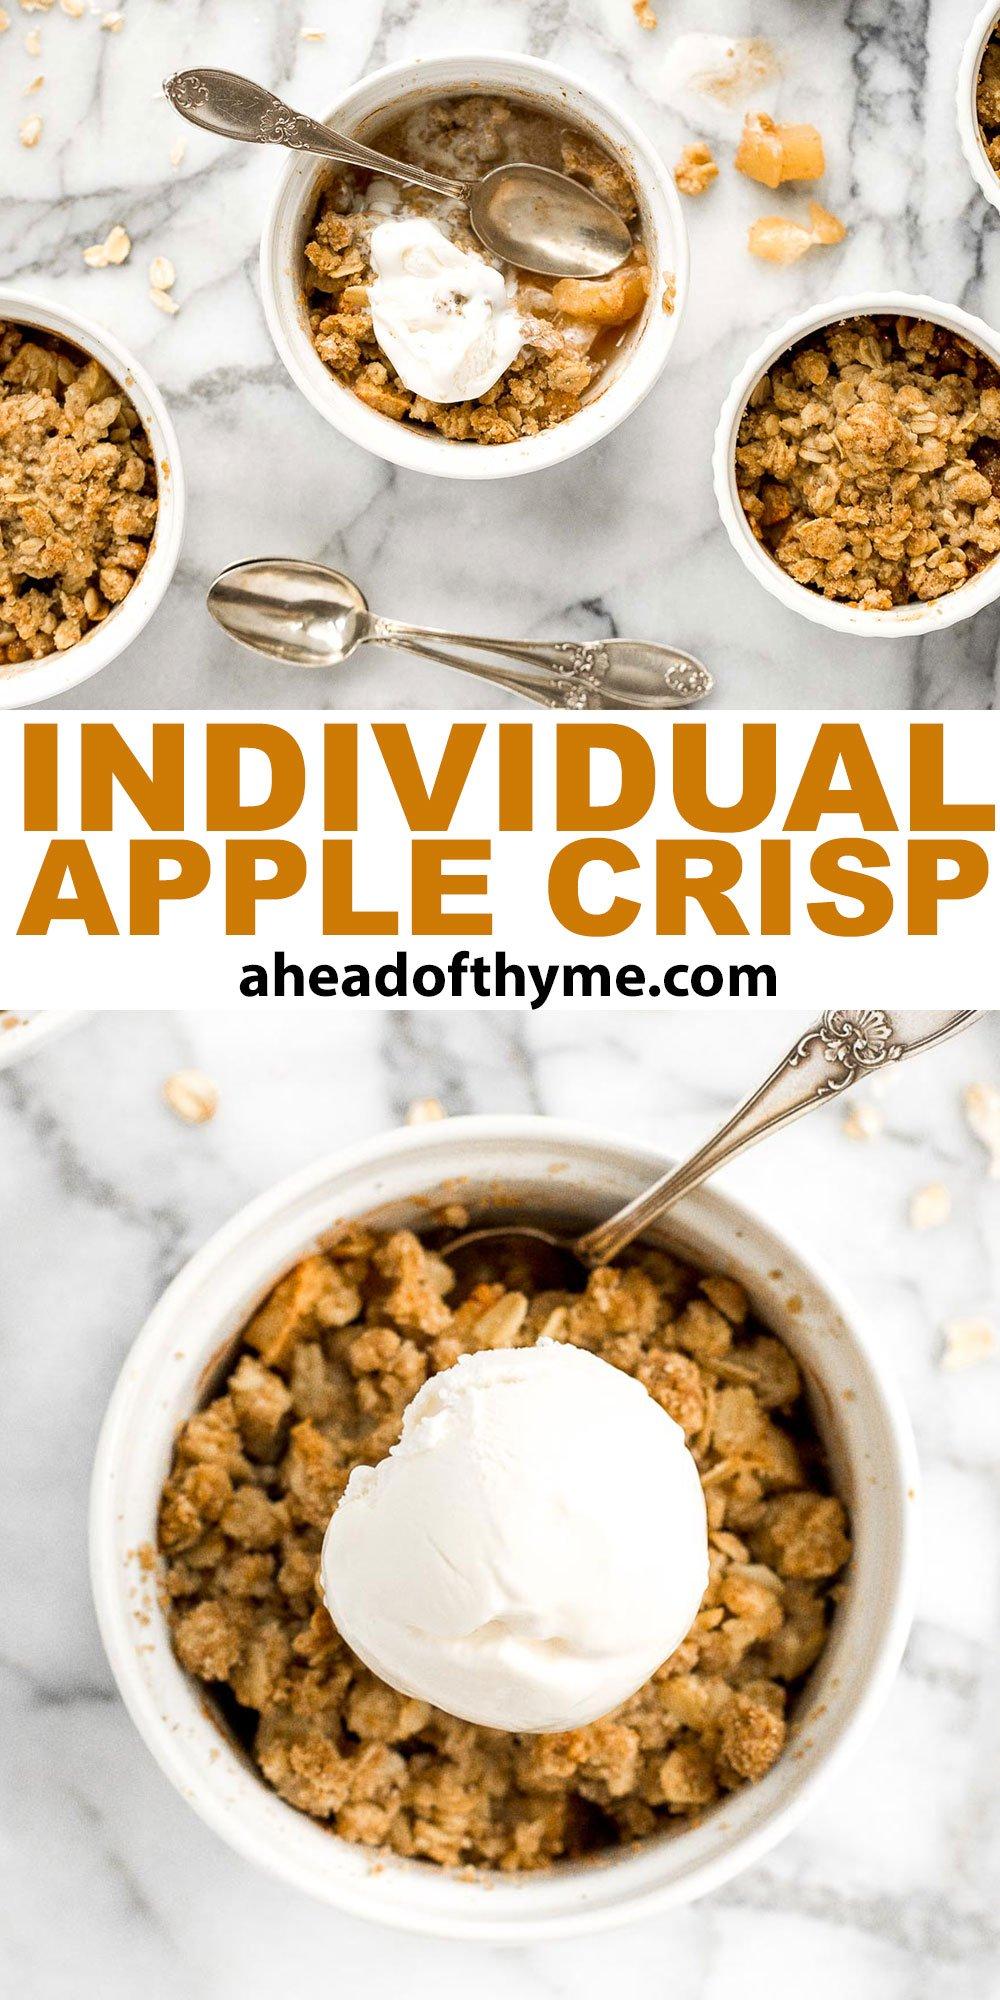 Individual Apple Crisp